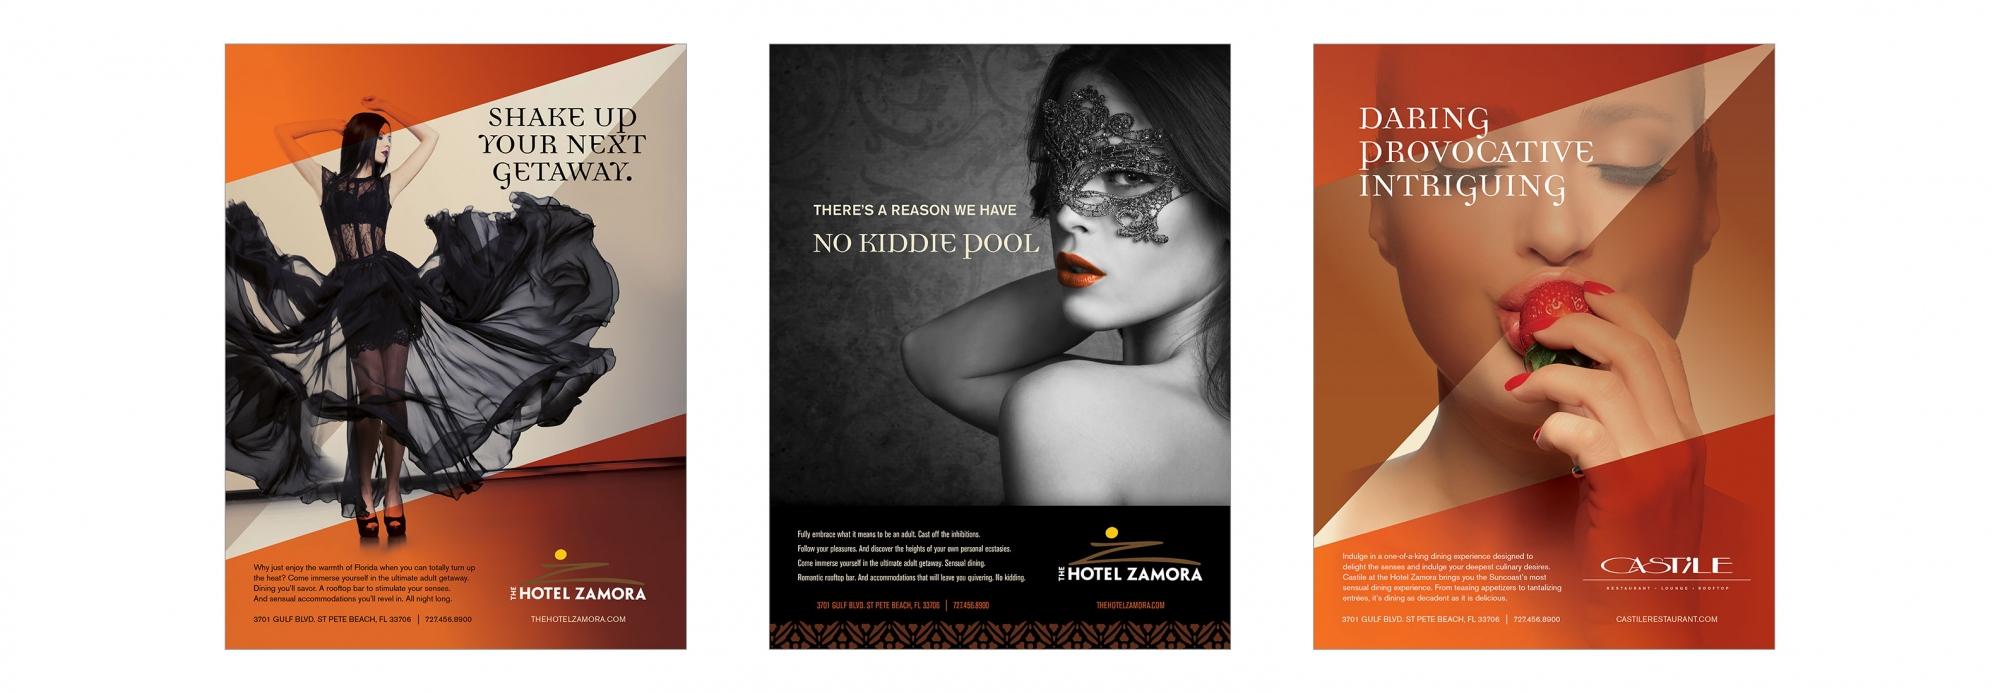 Hotel Zamora Print Ads